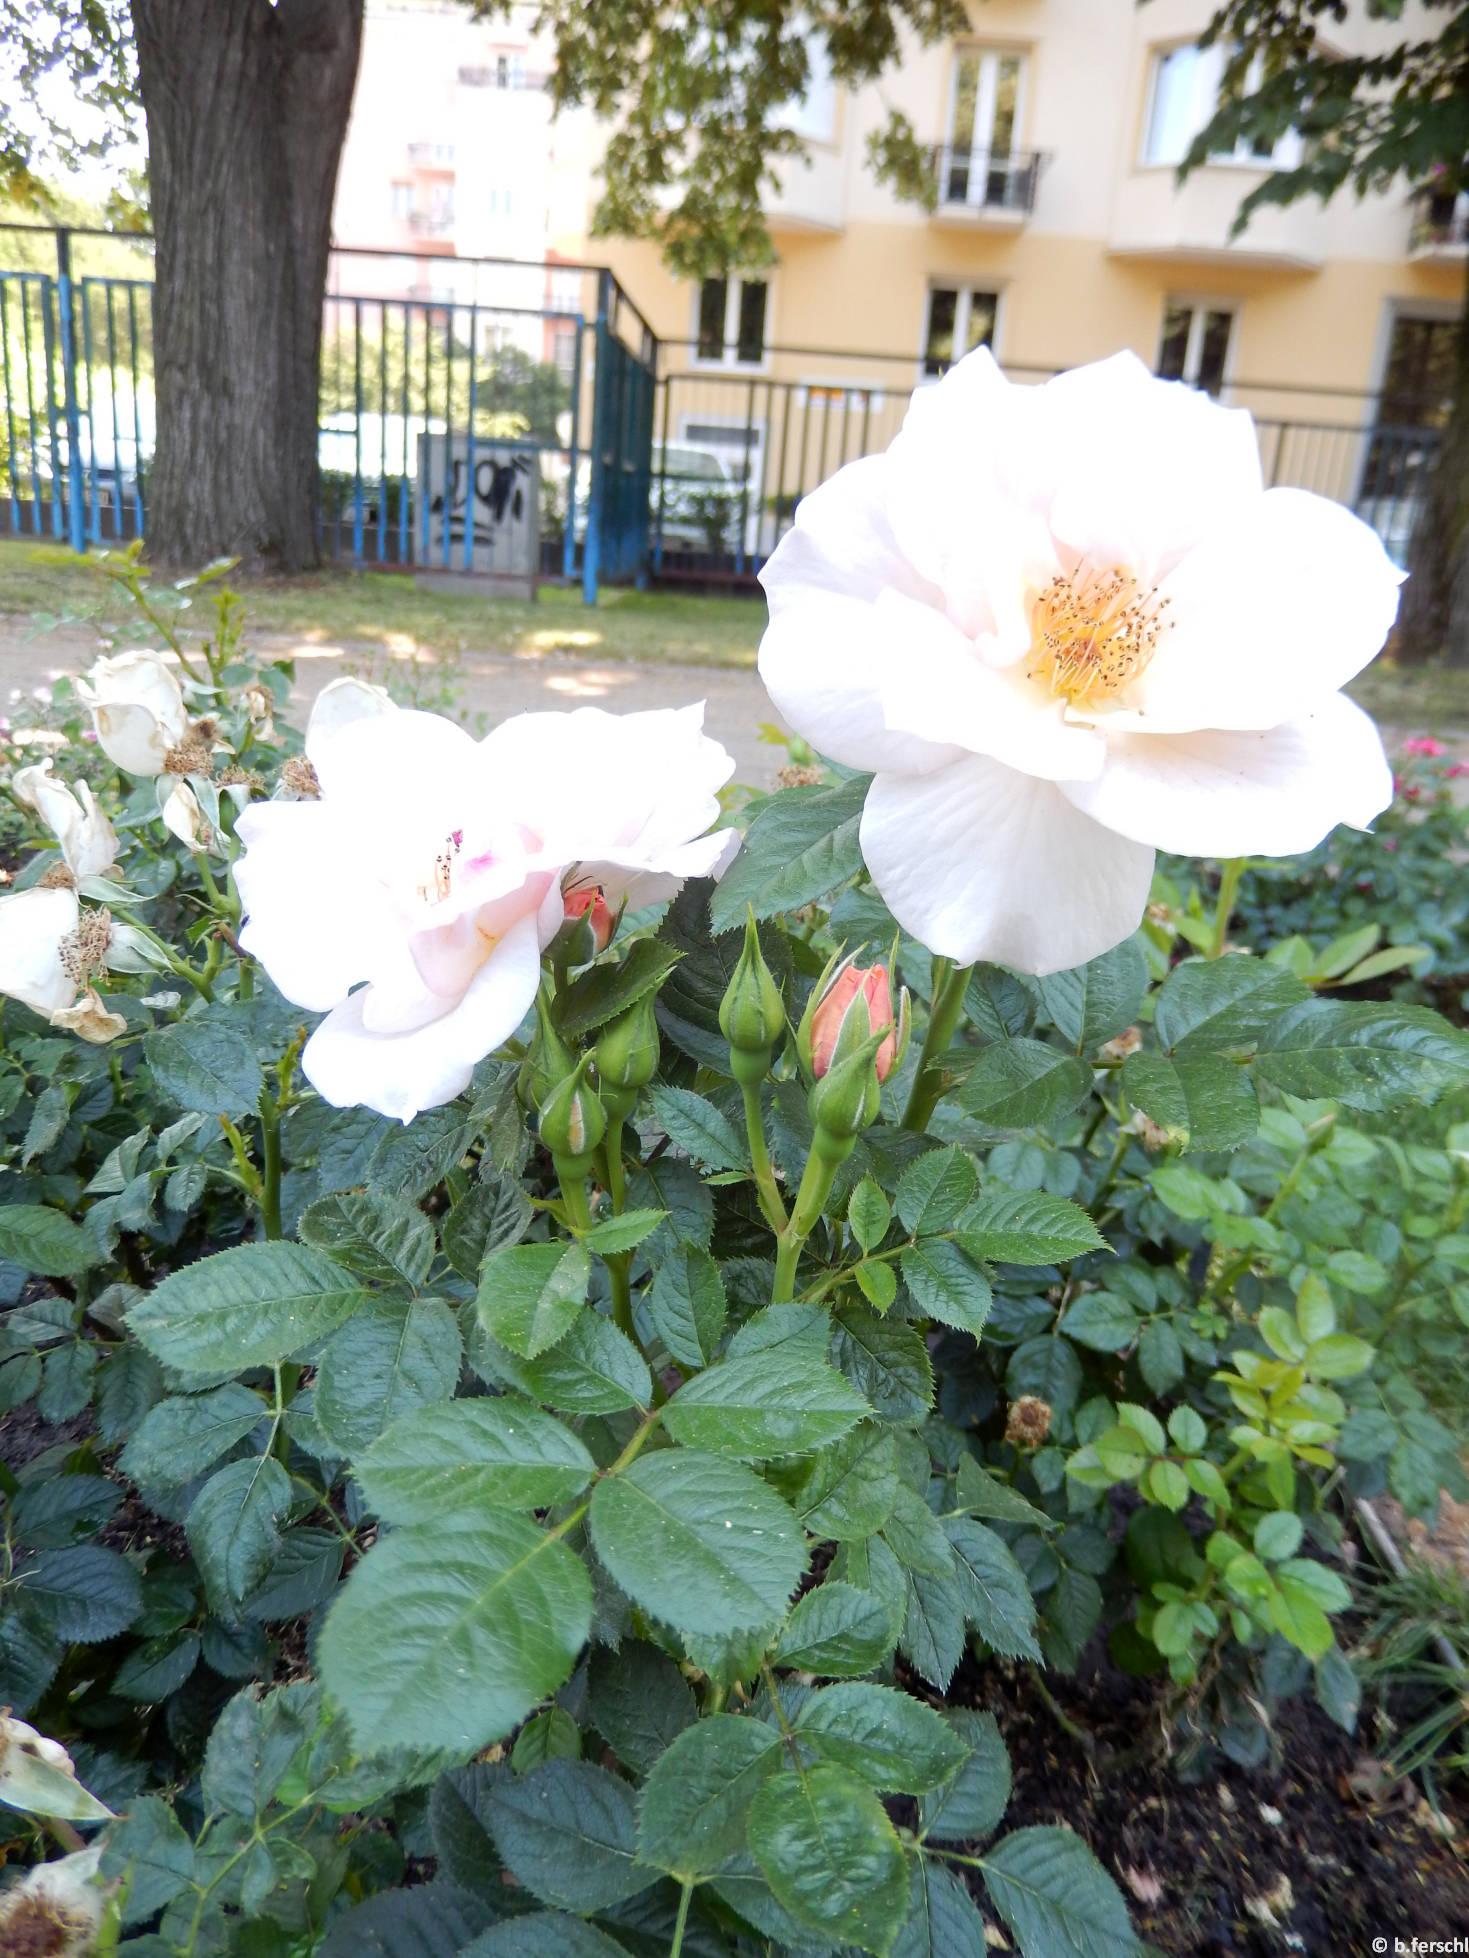 Hild József emléke floribunda rózsa (2014. június)